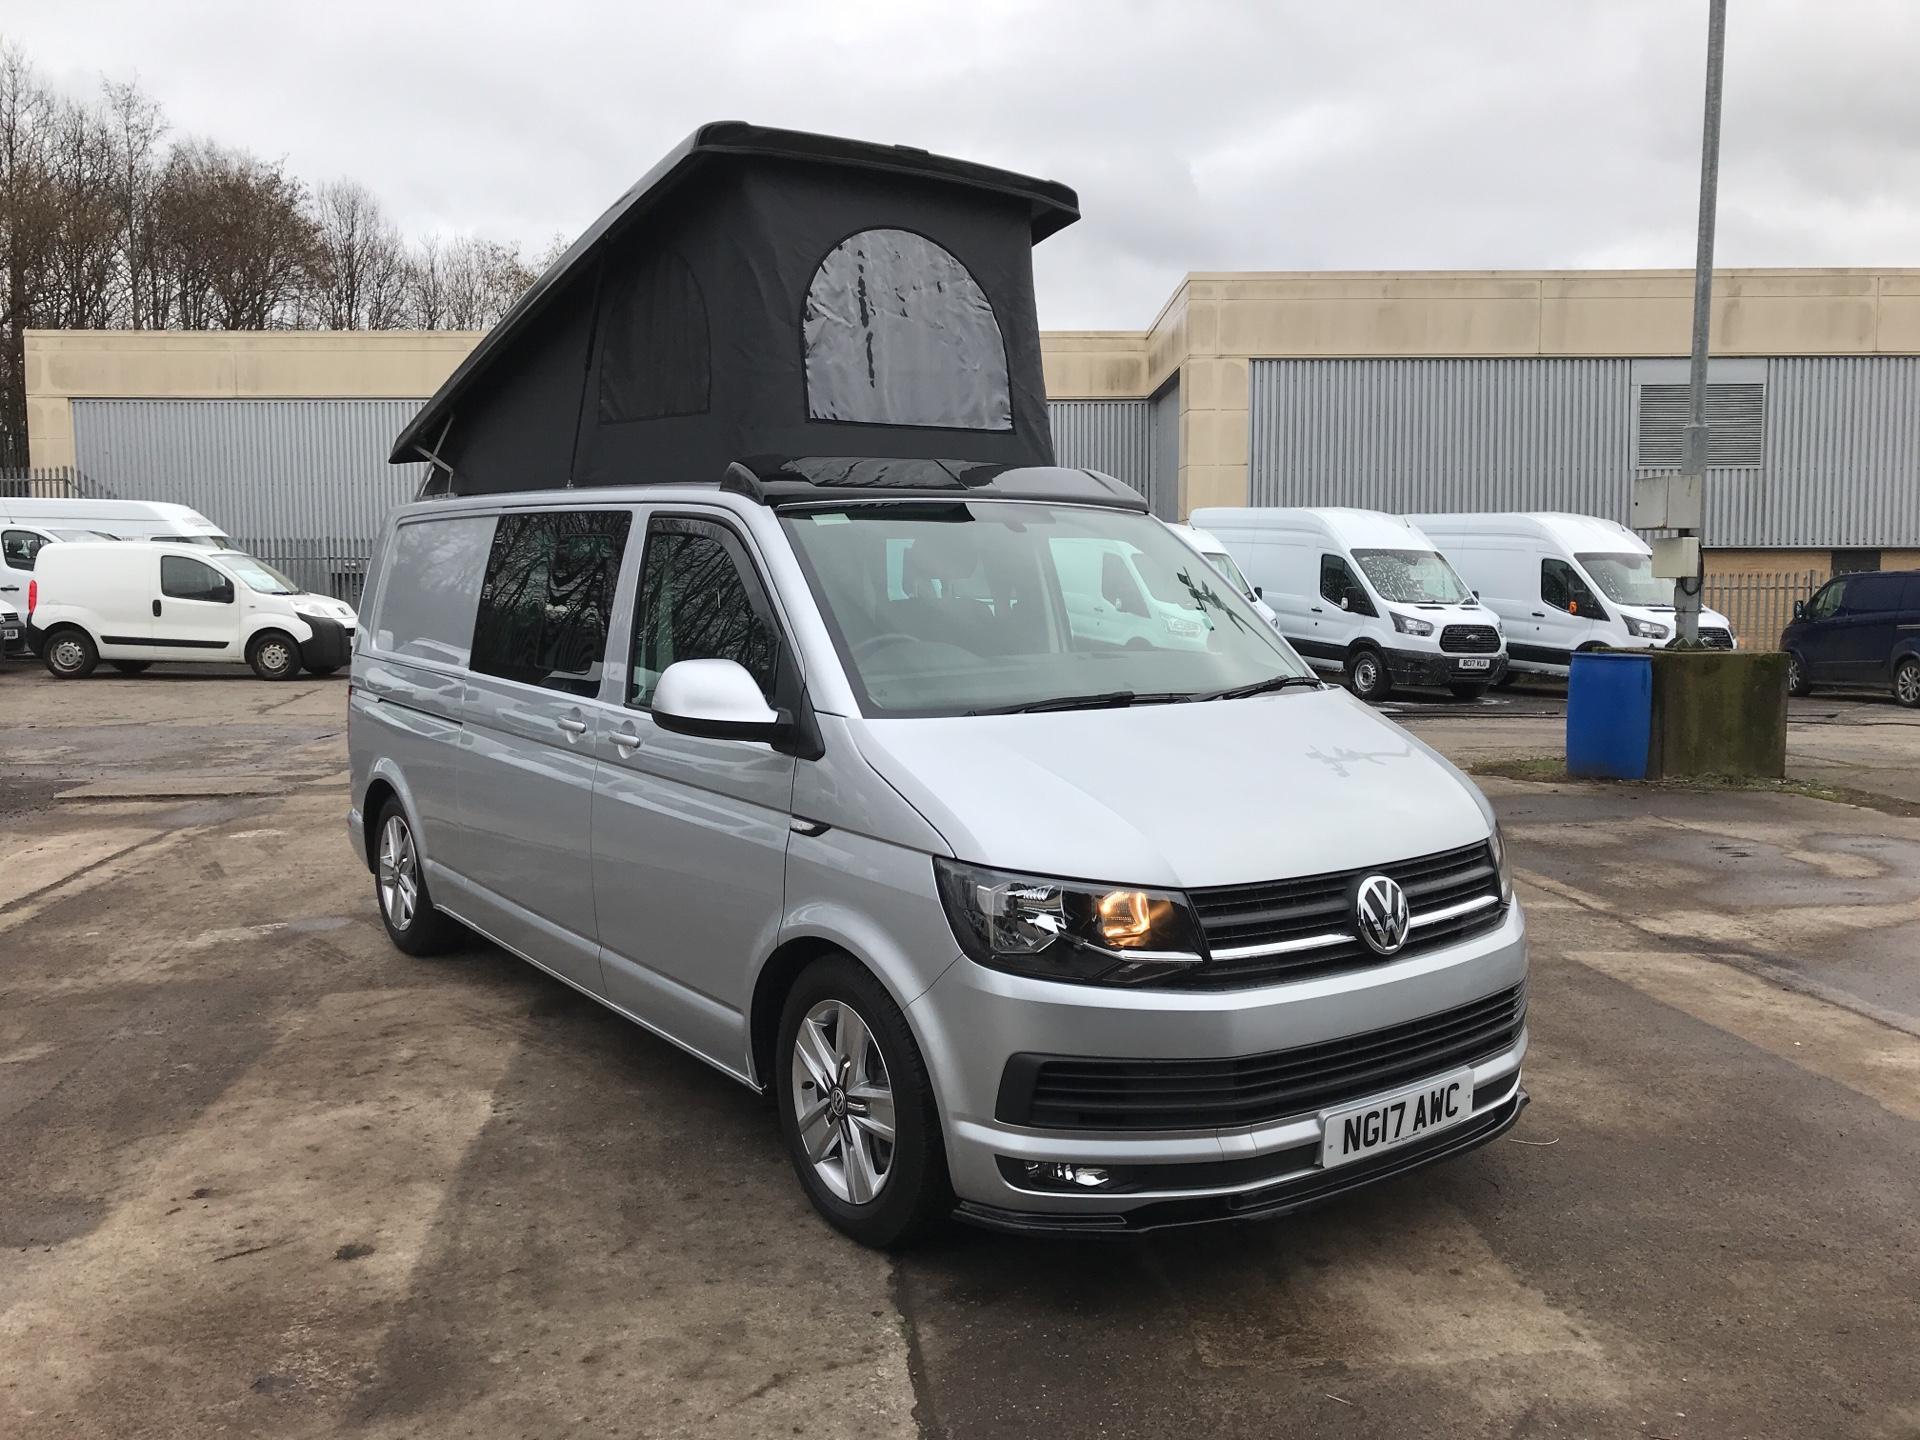 2017 Volkswagen Transporter T32 LWB 2.0TDI BMT 204PS HIGHLINE KOMBI VAN EURO 6 (NG17AWC)